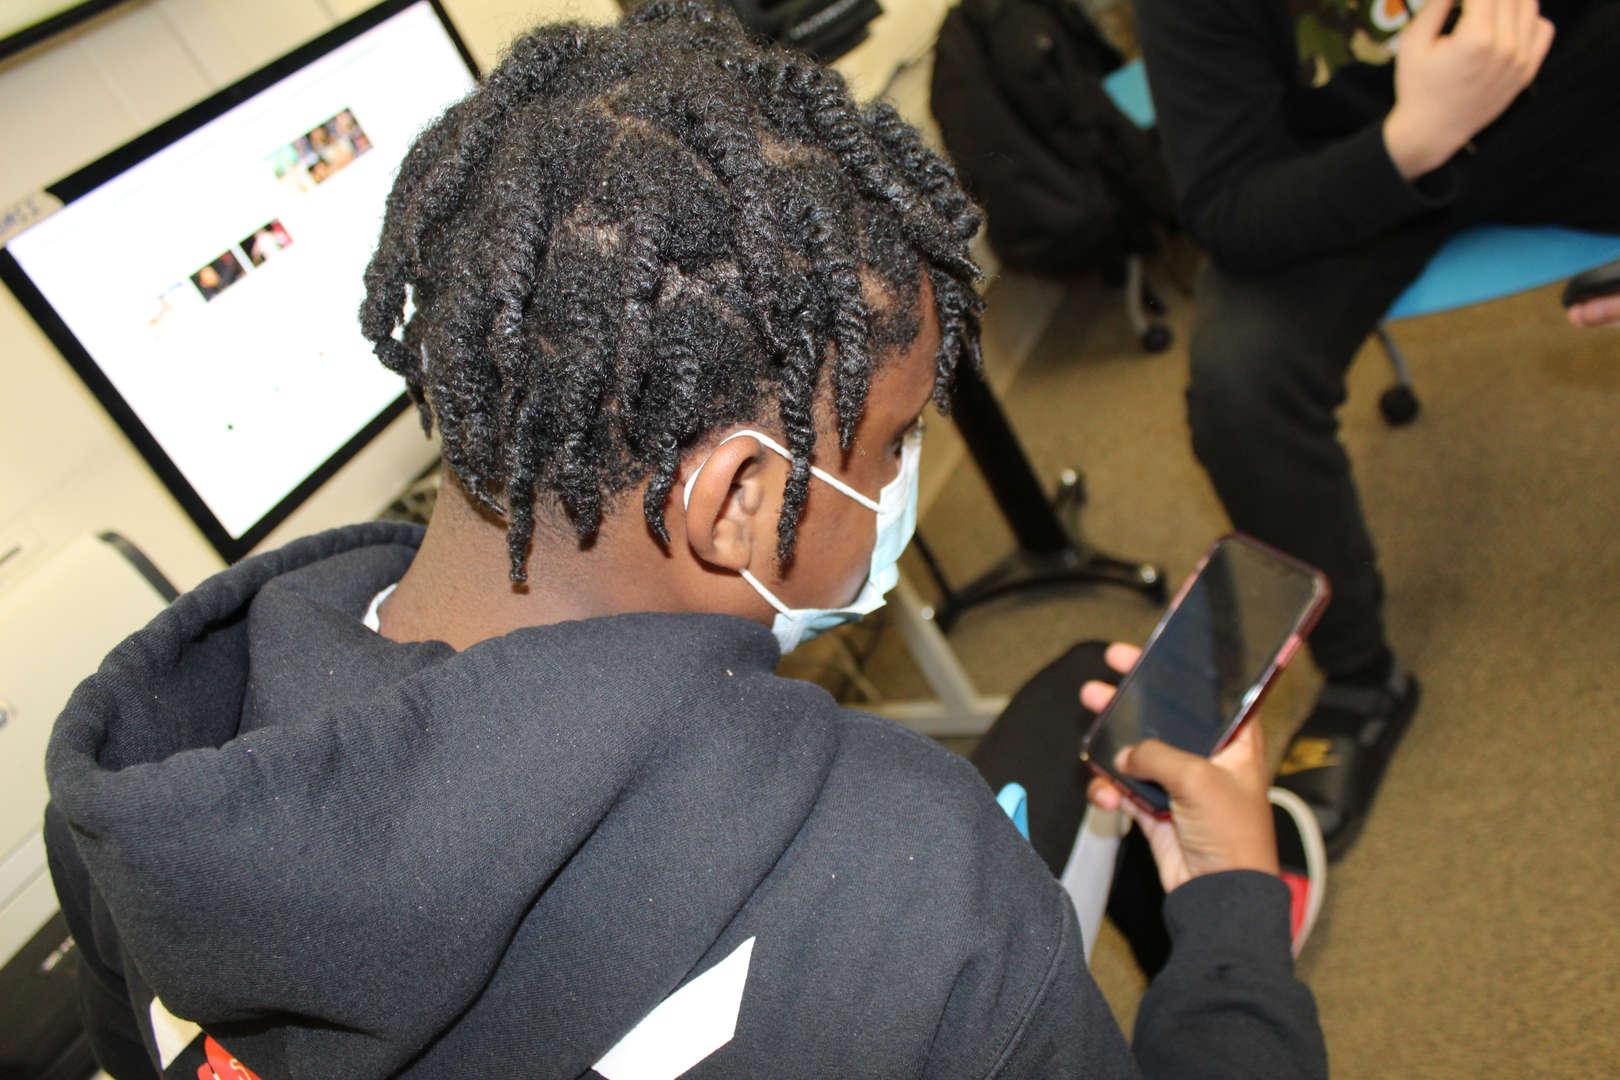 Student using app on smartphone